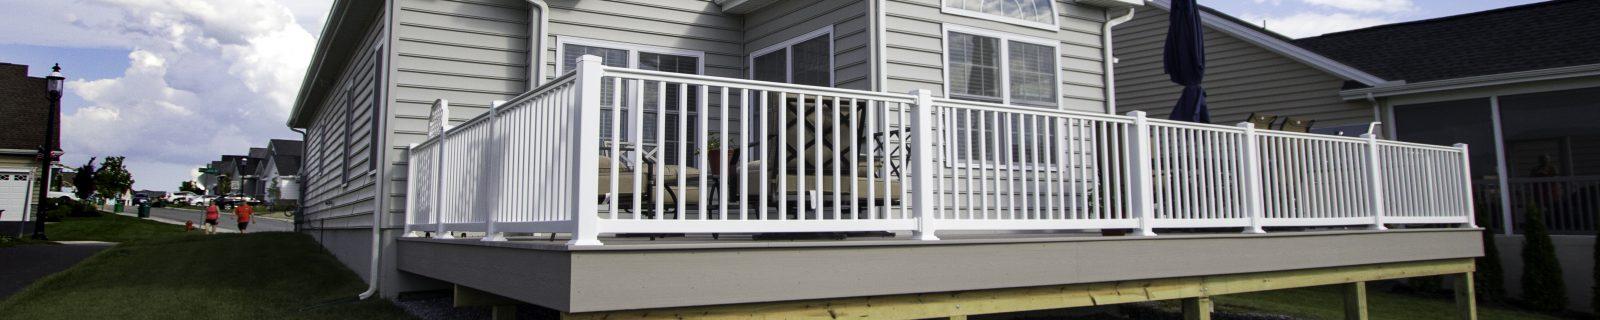 Railing And Porch Posts Vinyl Railings Vinyls Railings Around Deck ...